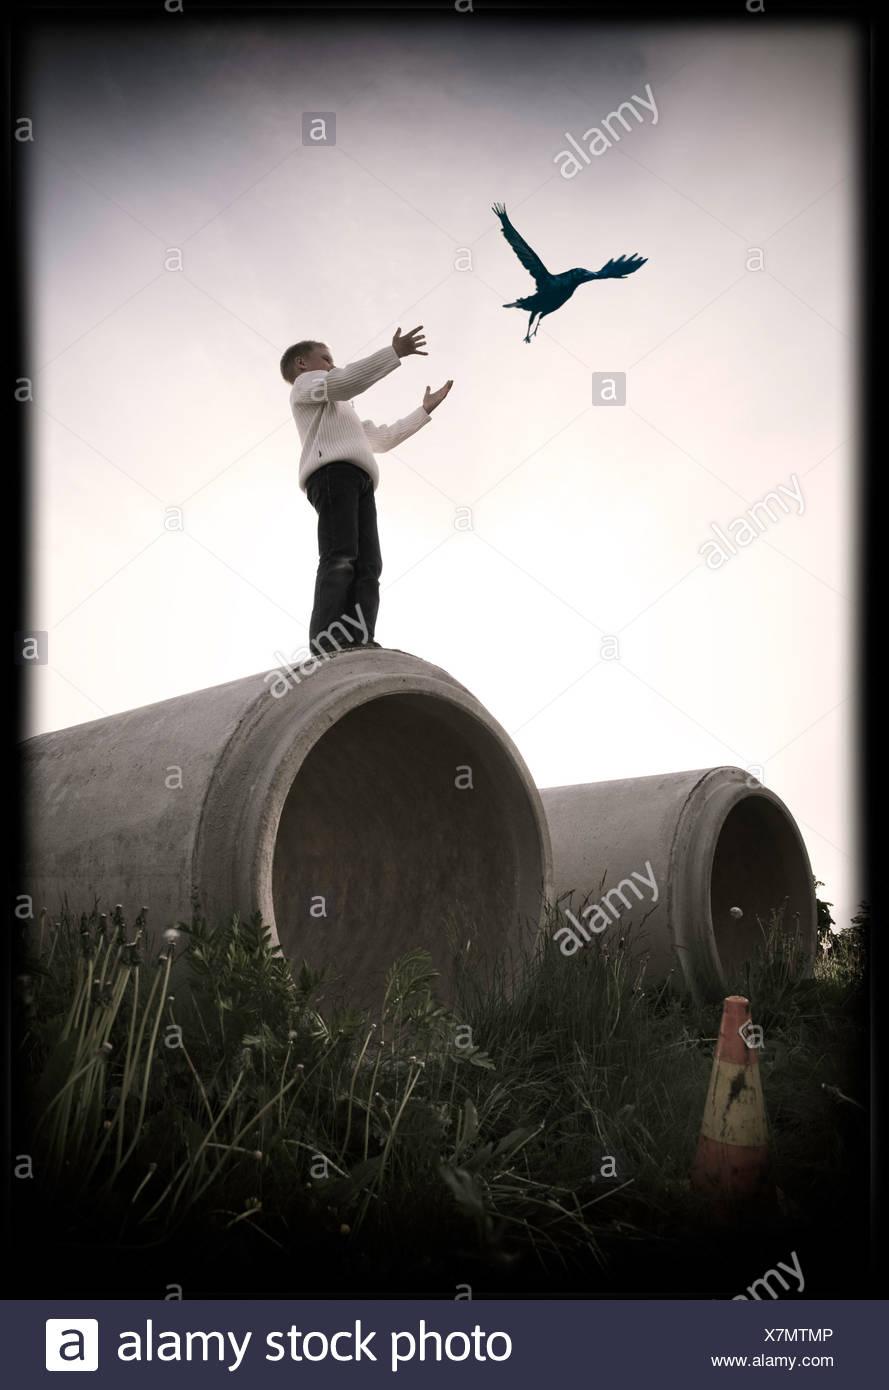 Kleiner Junge steht auf große konkrete Abfluss Freigabe Vogel Stockbild